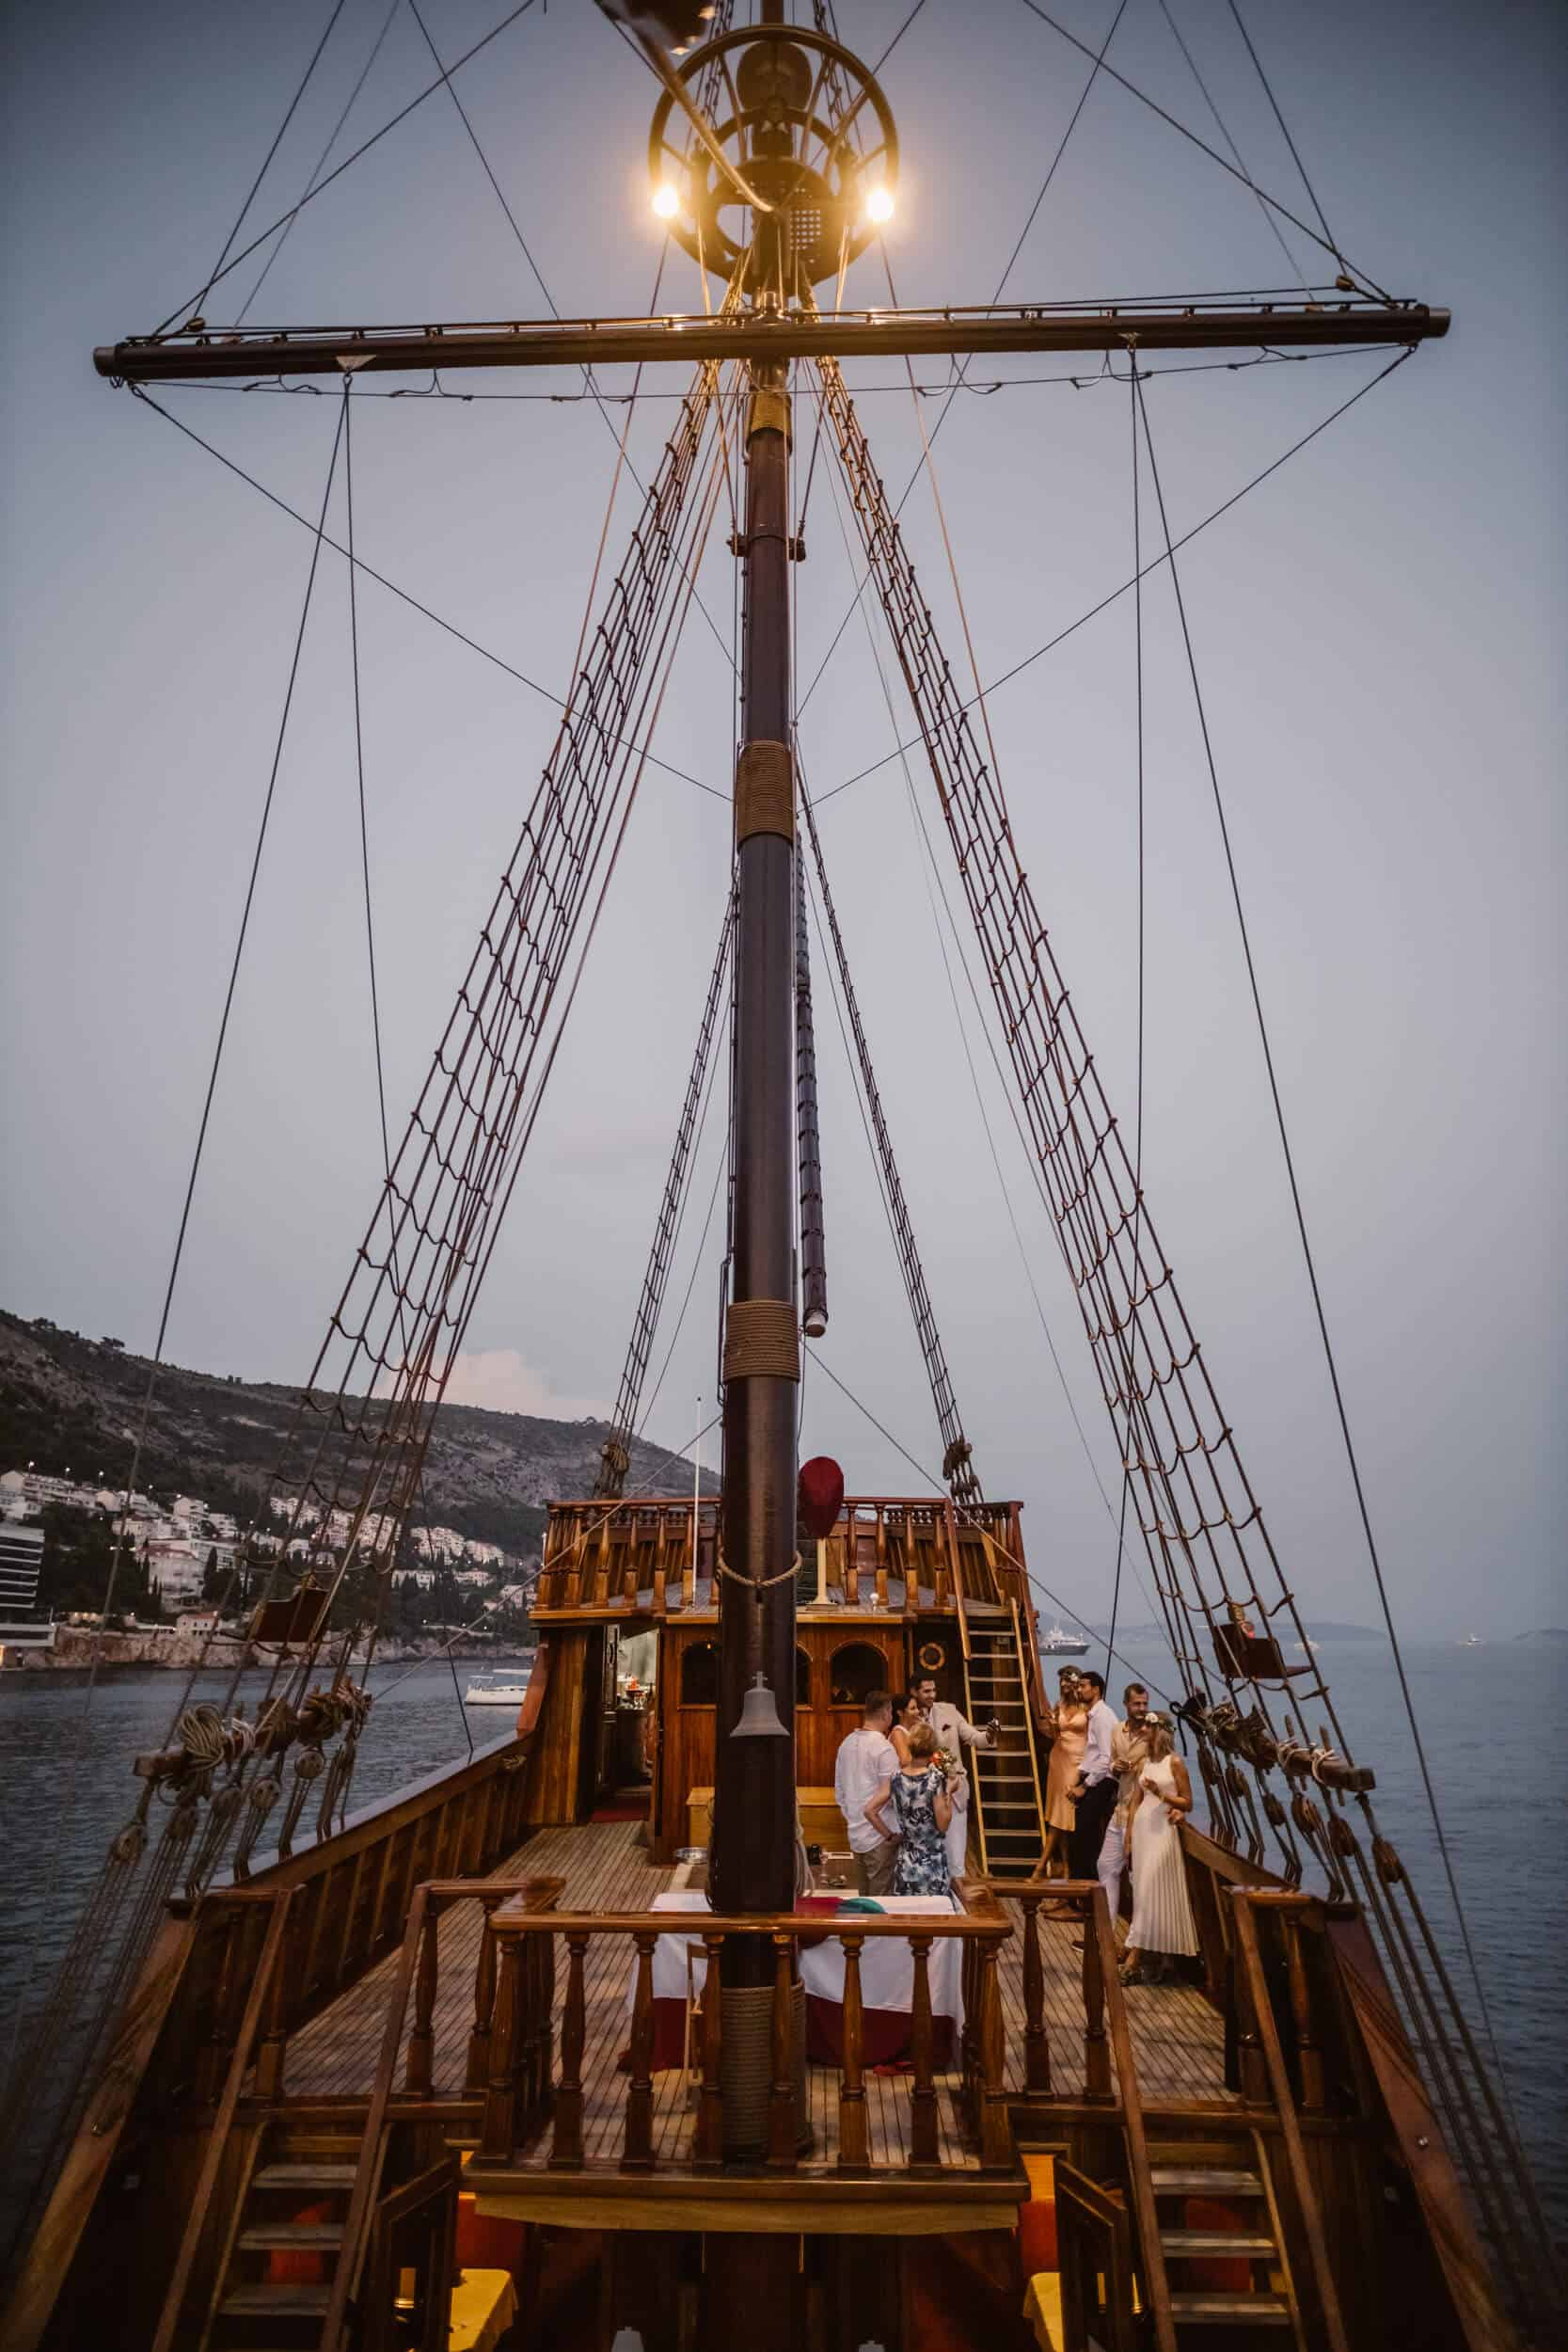 Dubrovnik karaka boat elopement matea stephan 24 | Croatia Elopement Photographer and Videographer